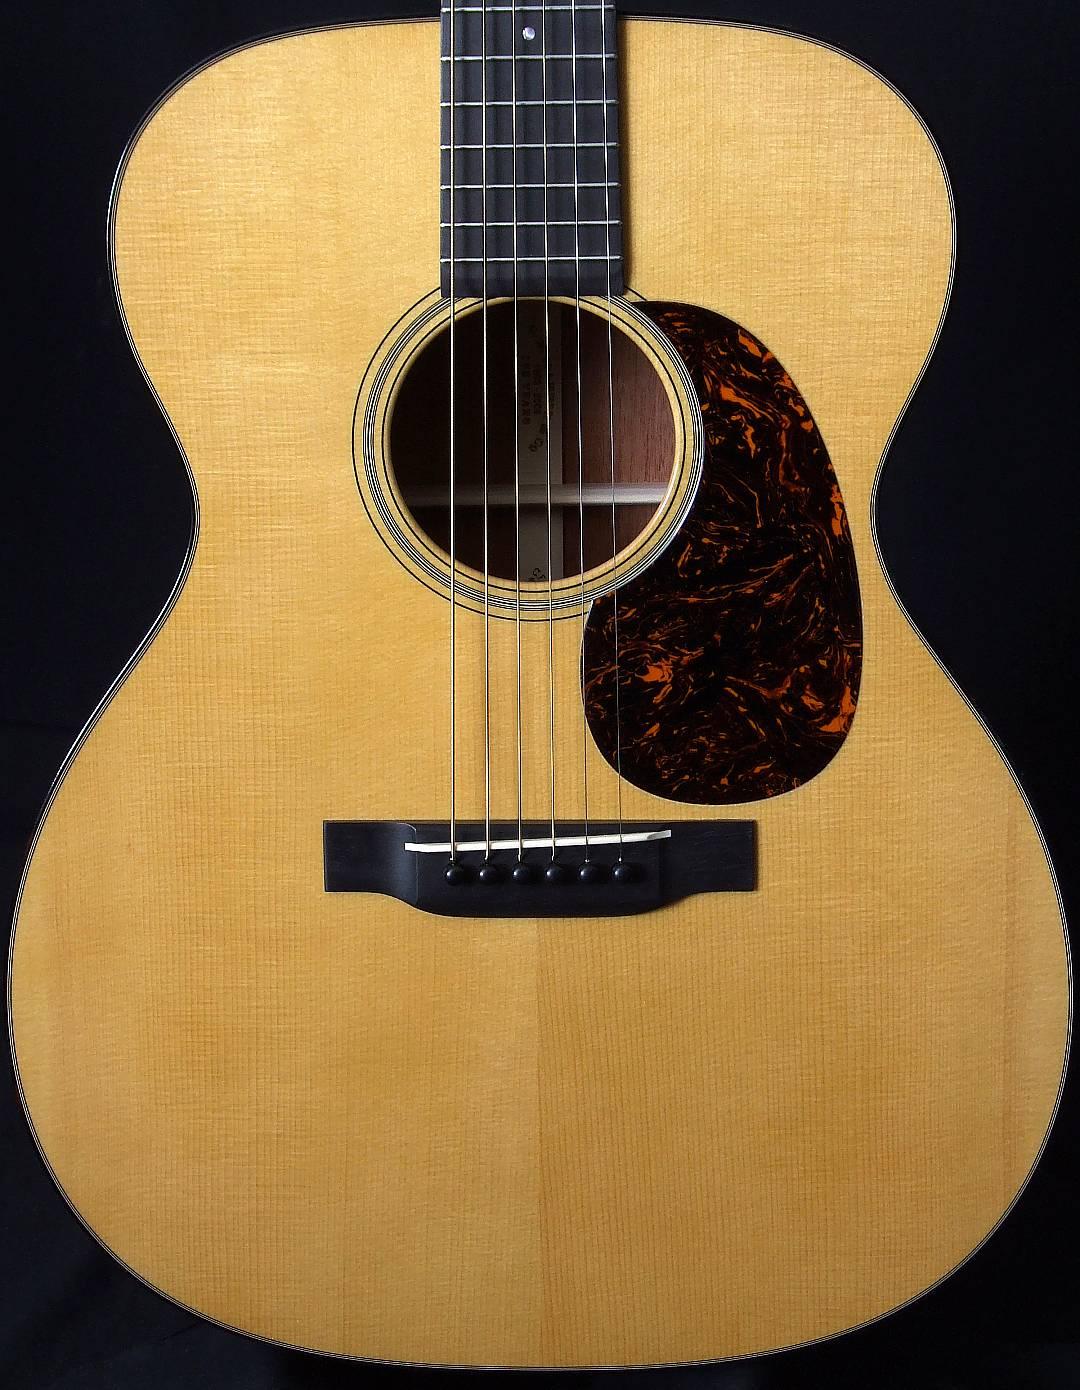 Martin_000-18_Authentic_1937_guitar_top